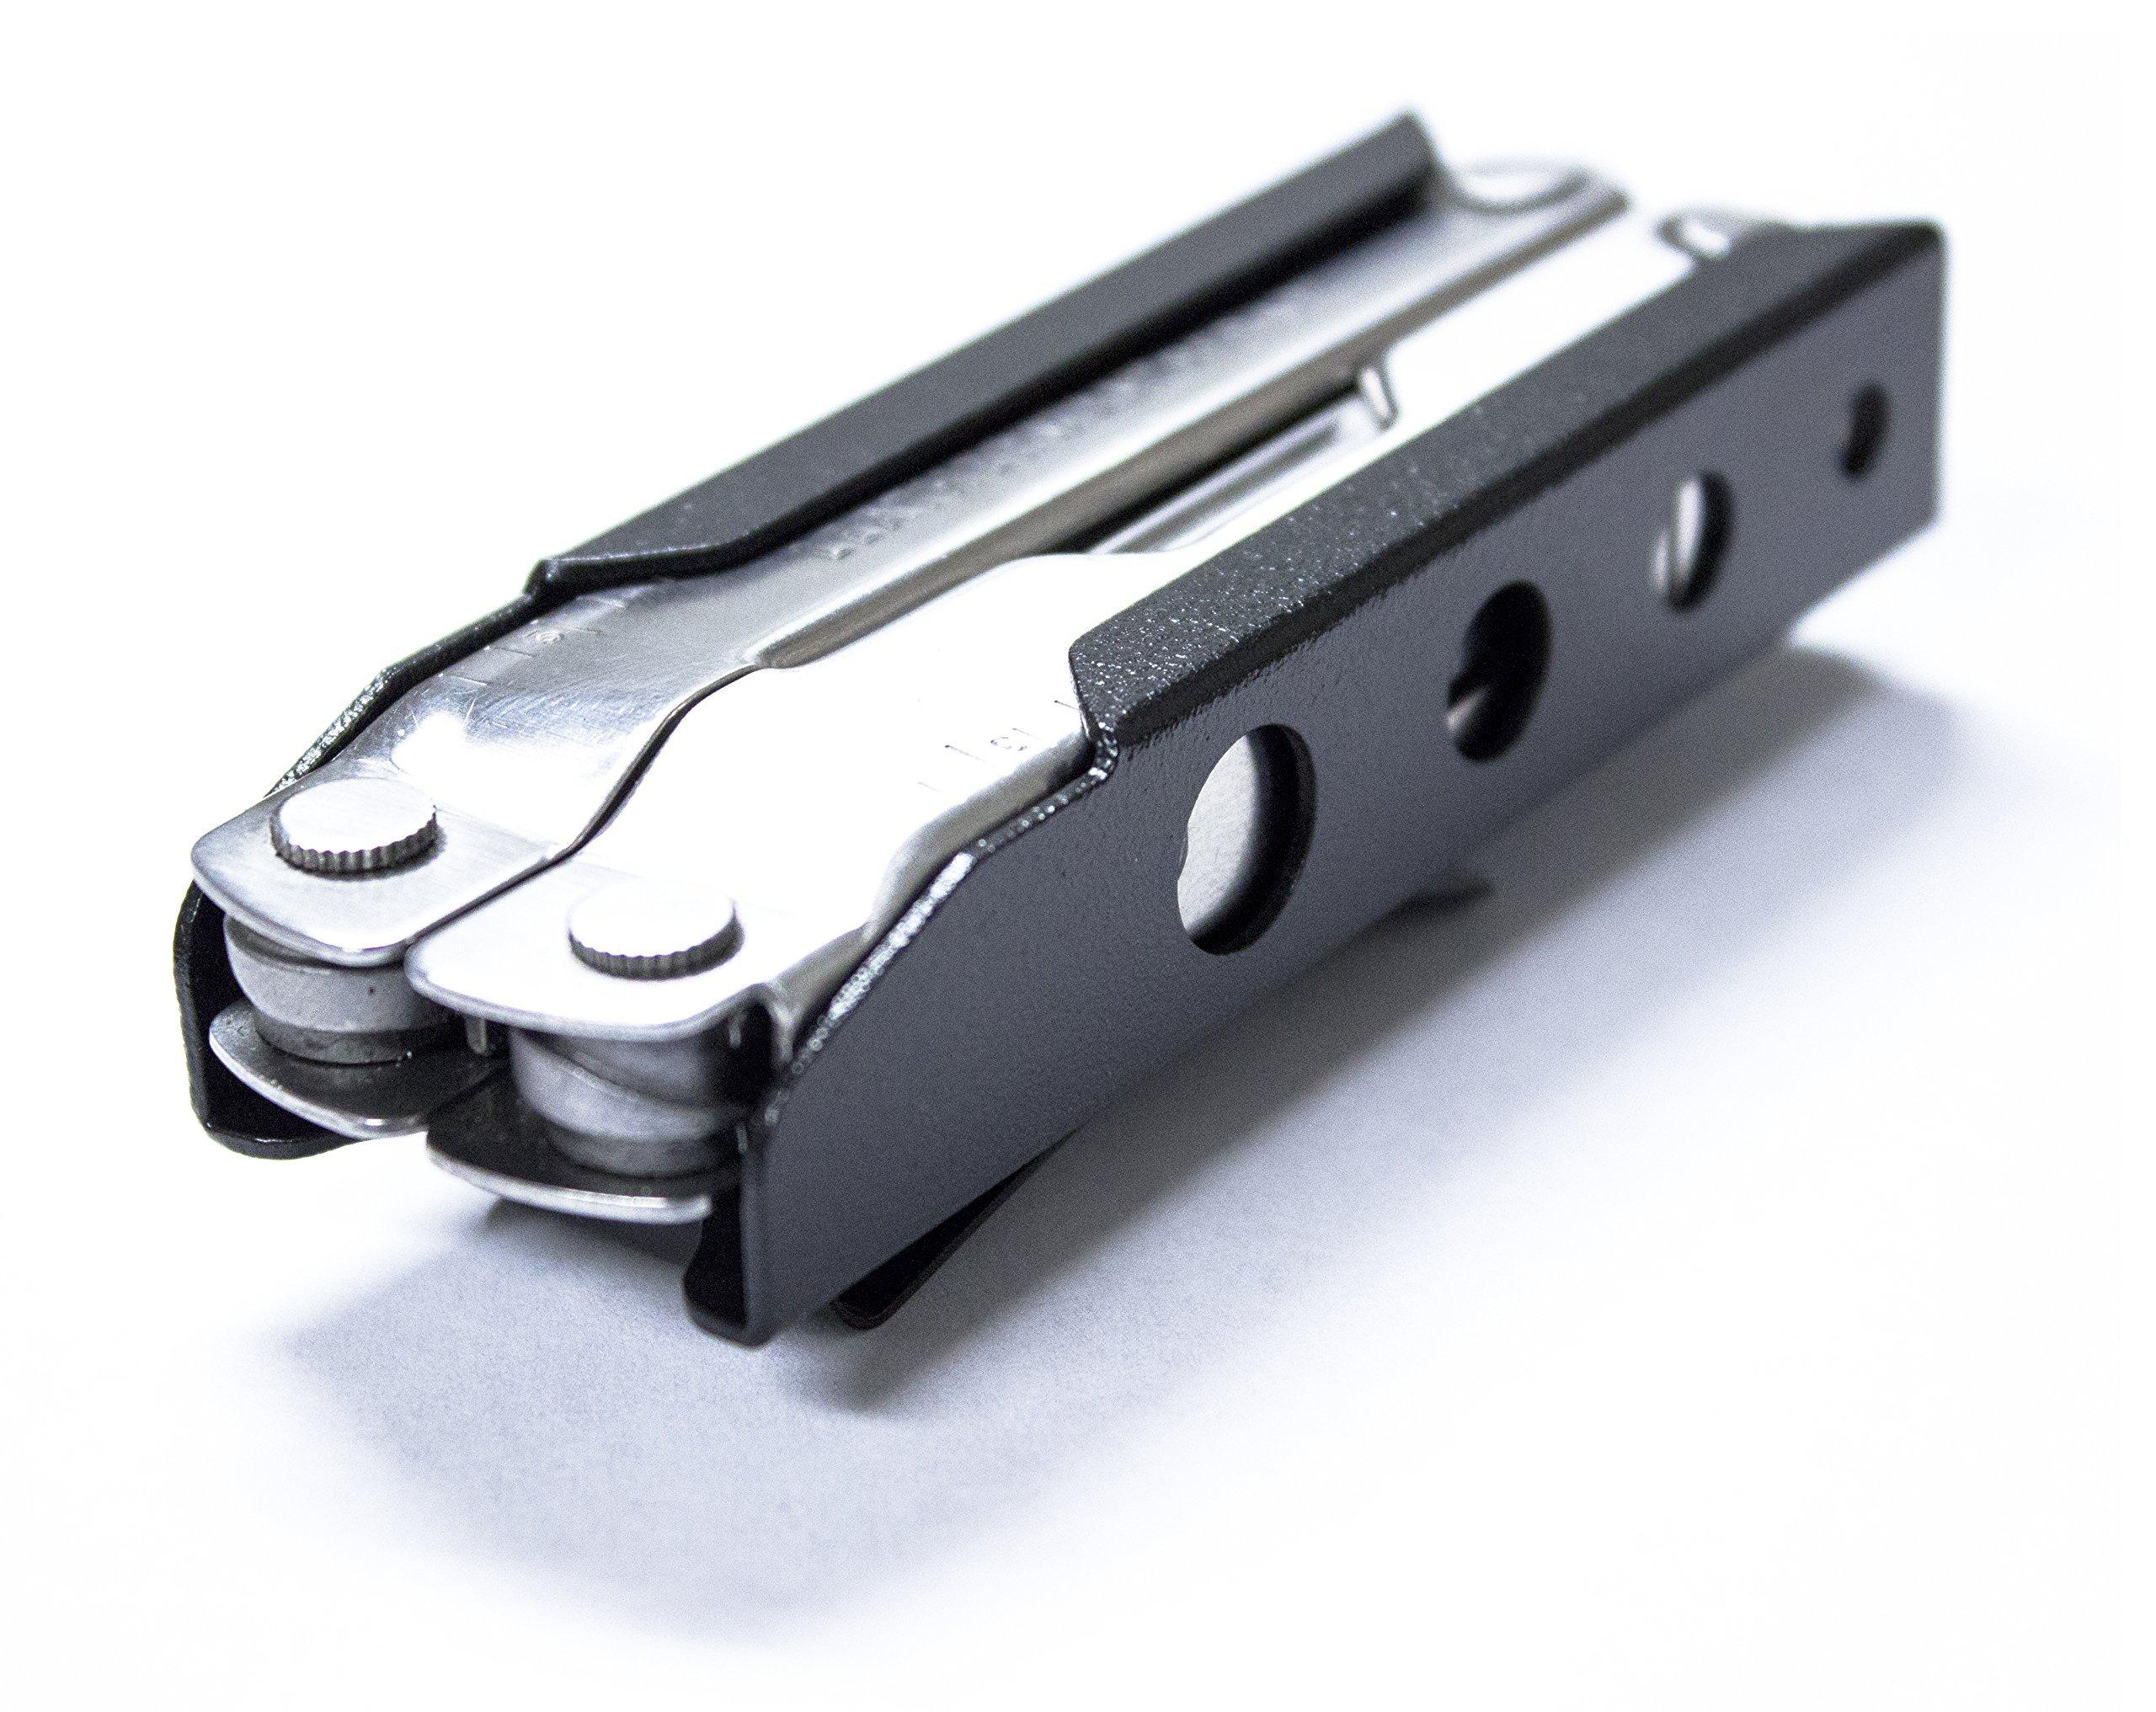 RAE GEAR Supertool 300 sheath compatible with Leatherman  (1.5'' BELT CLIP)